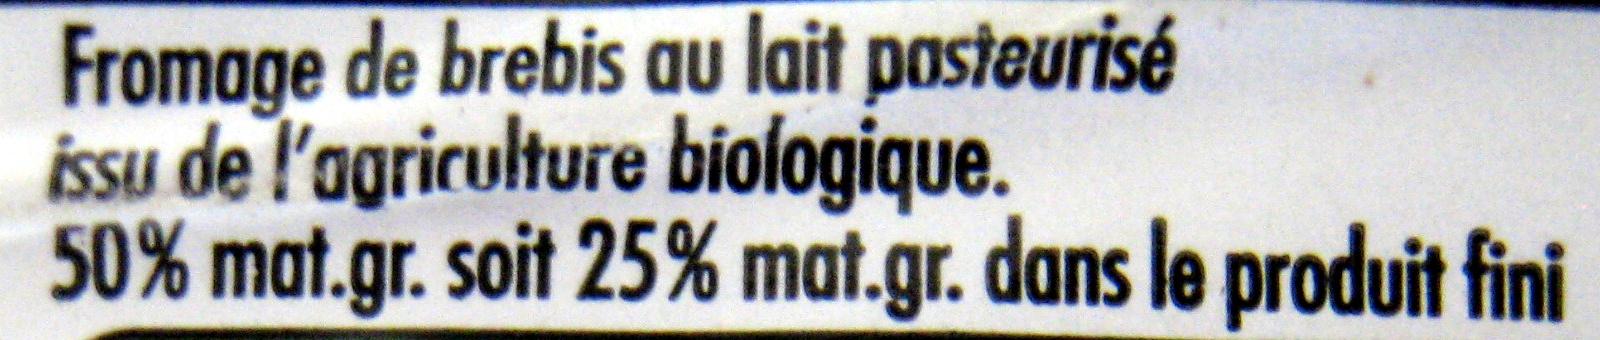 100 % Brebis Bio (25 % MG) - Ingredients - fr